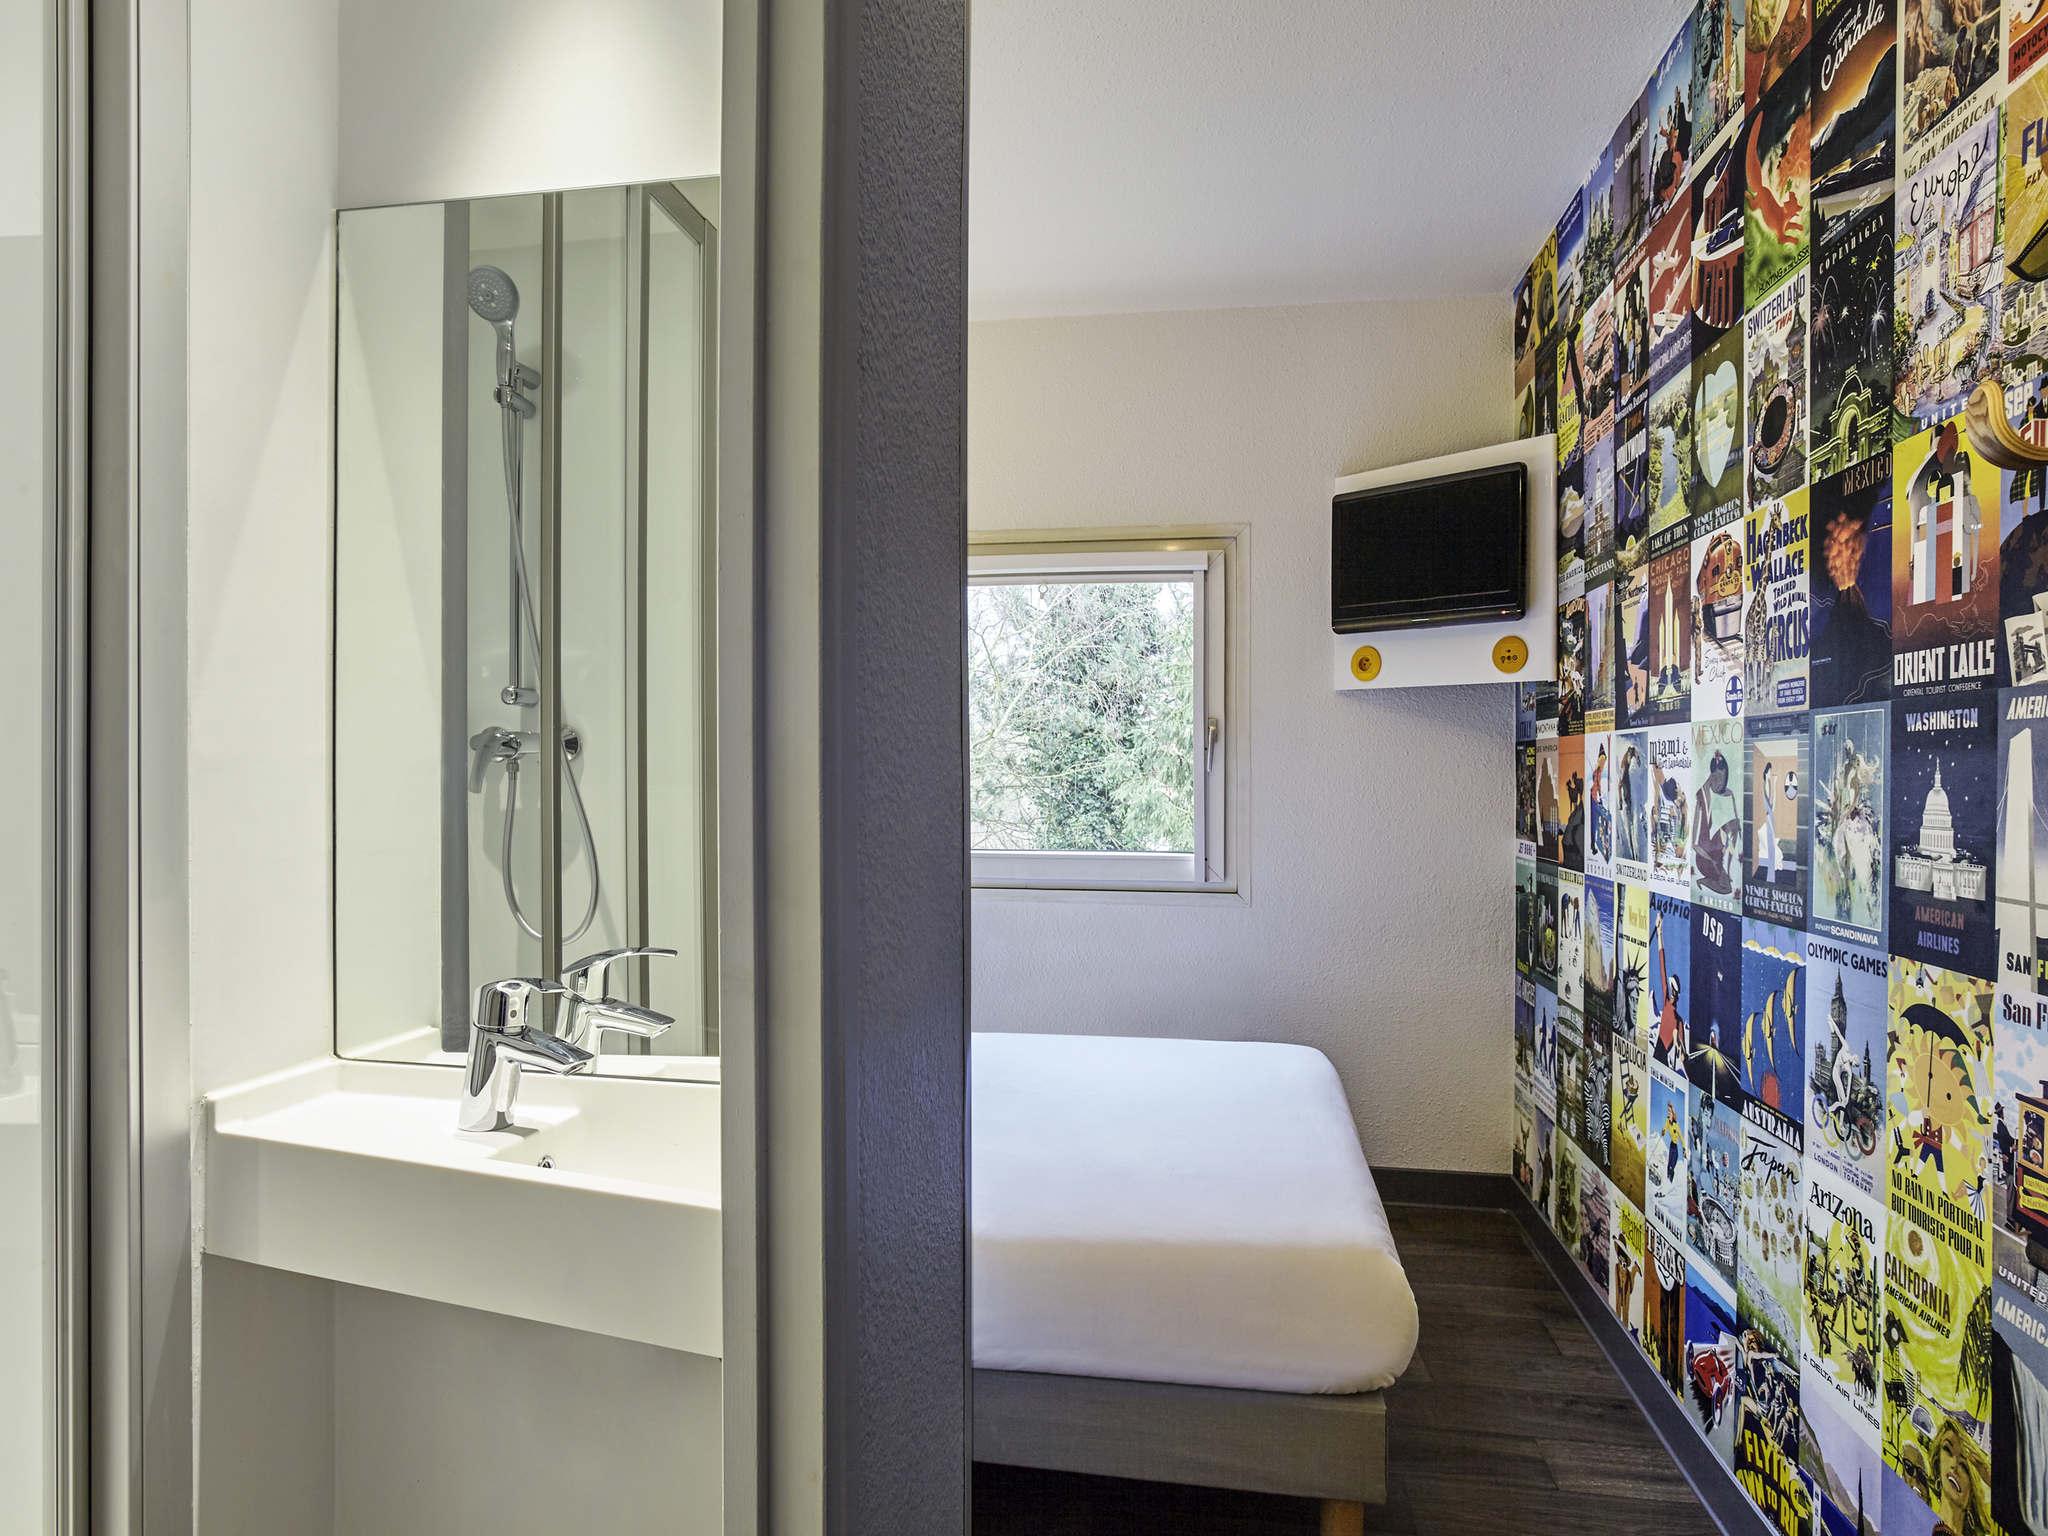 hotel w mie cie cabries hotelf1 marseille plan de campagne n 1 r nov. Black Bedroom Furniture Sets. Home Design Ideas